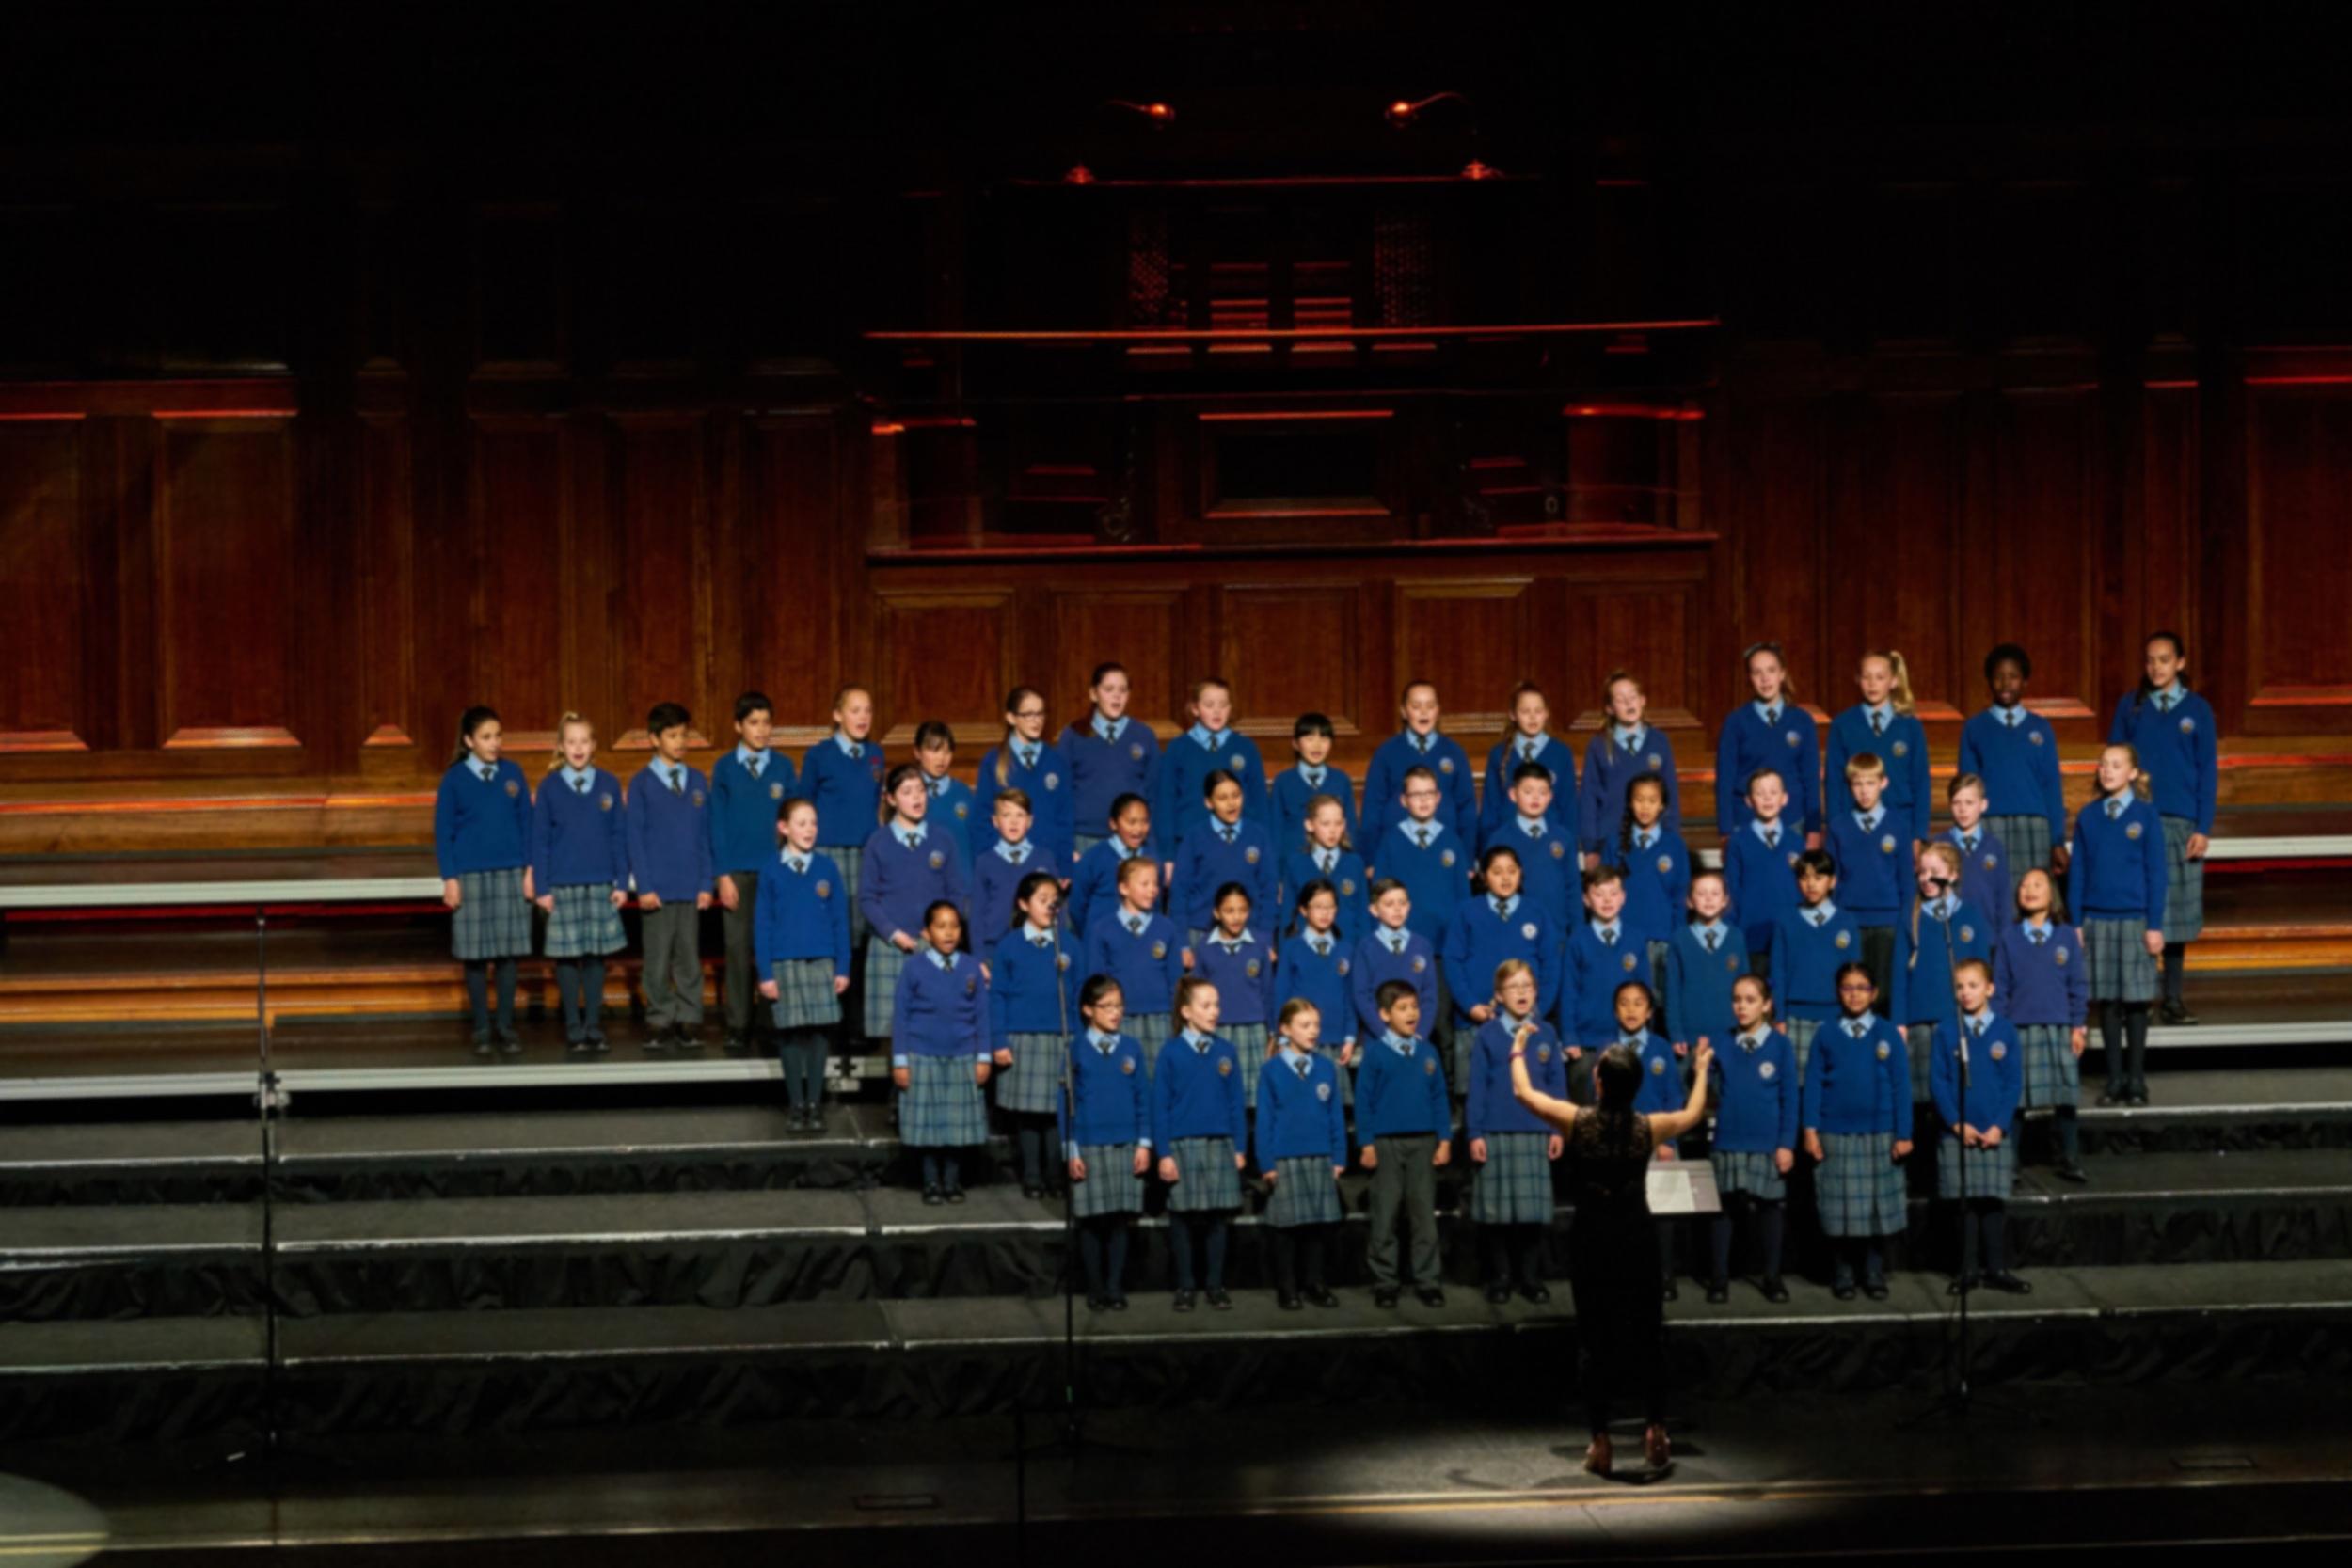 Choir02.jpg